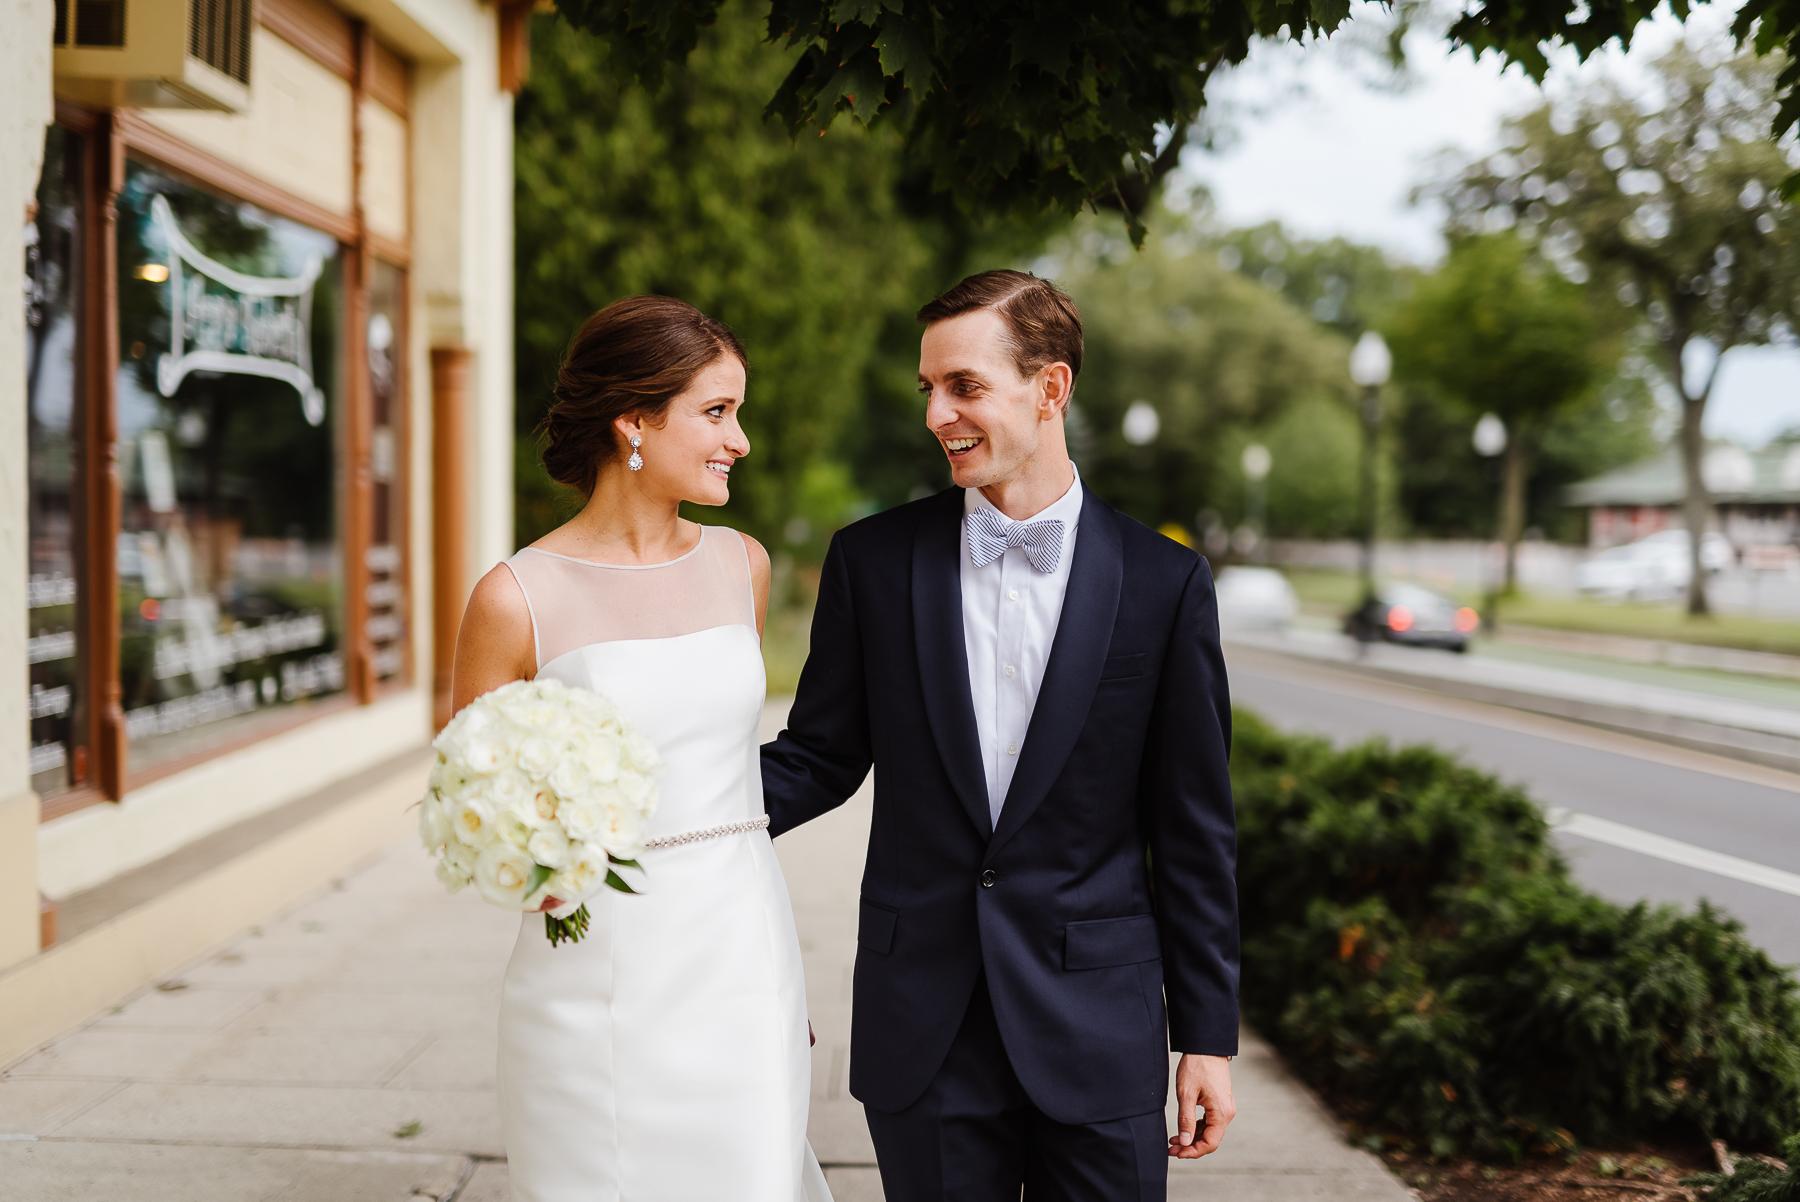 75-J Crew Wedding New Jersey Wedding Photographer J Crew Weddings.jpg